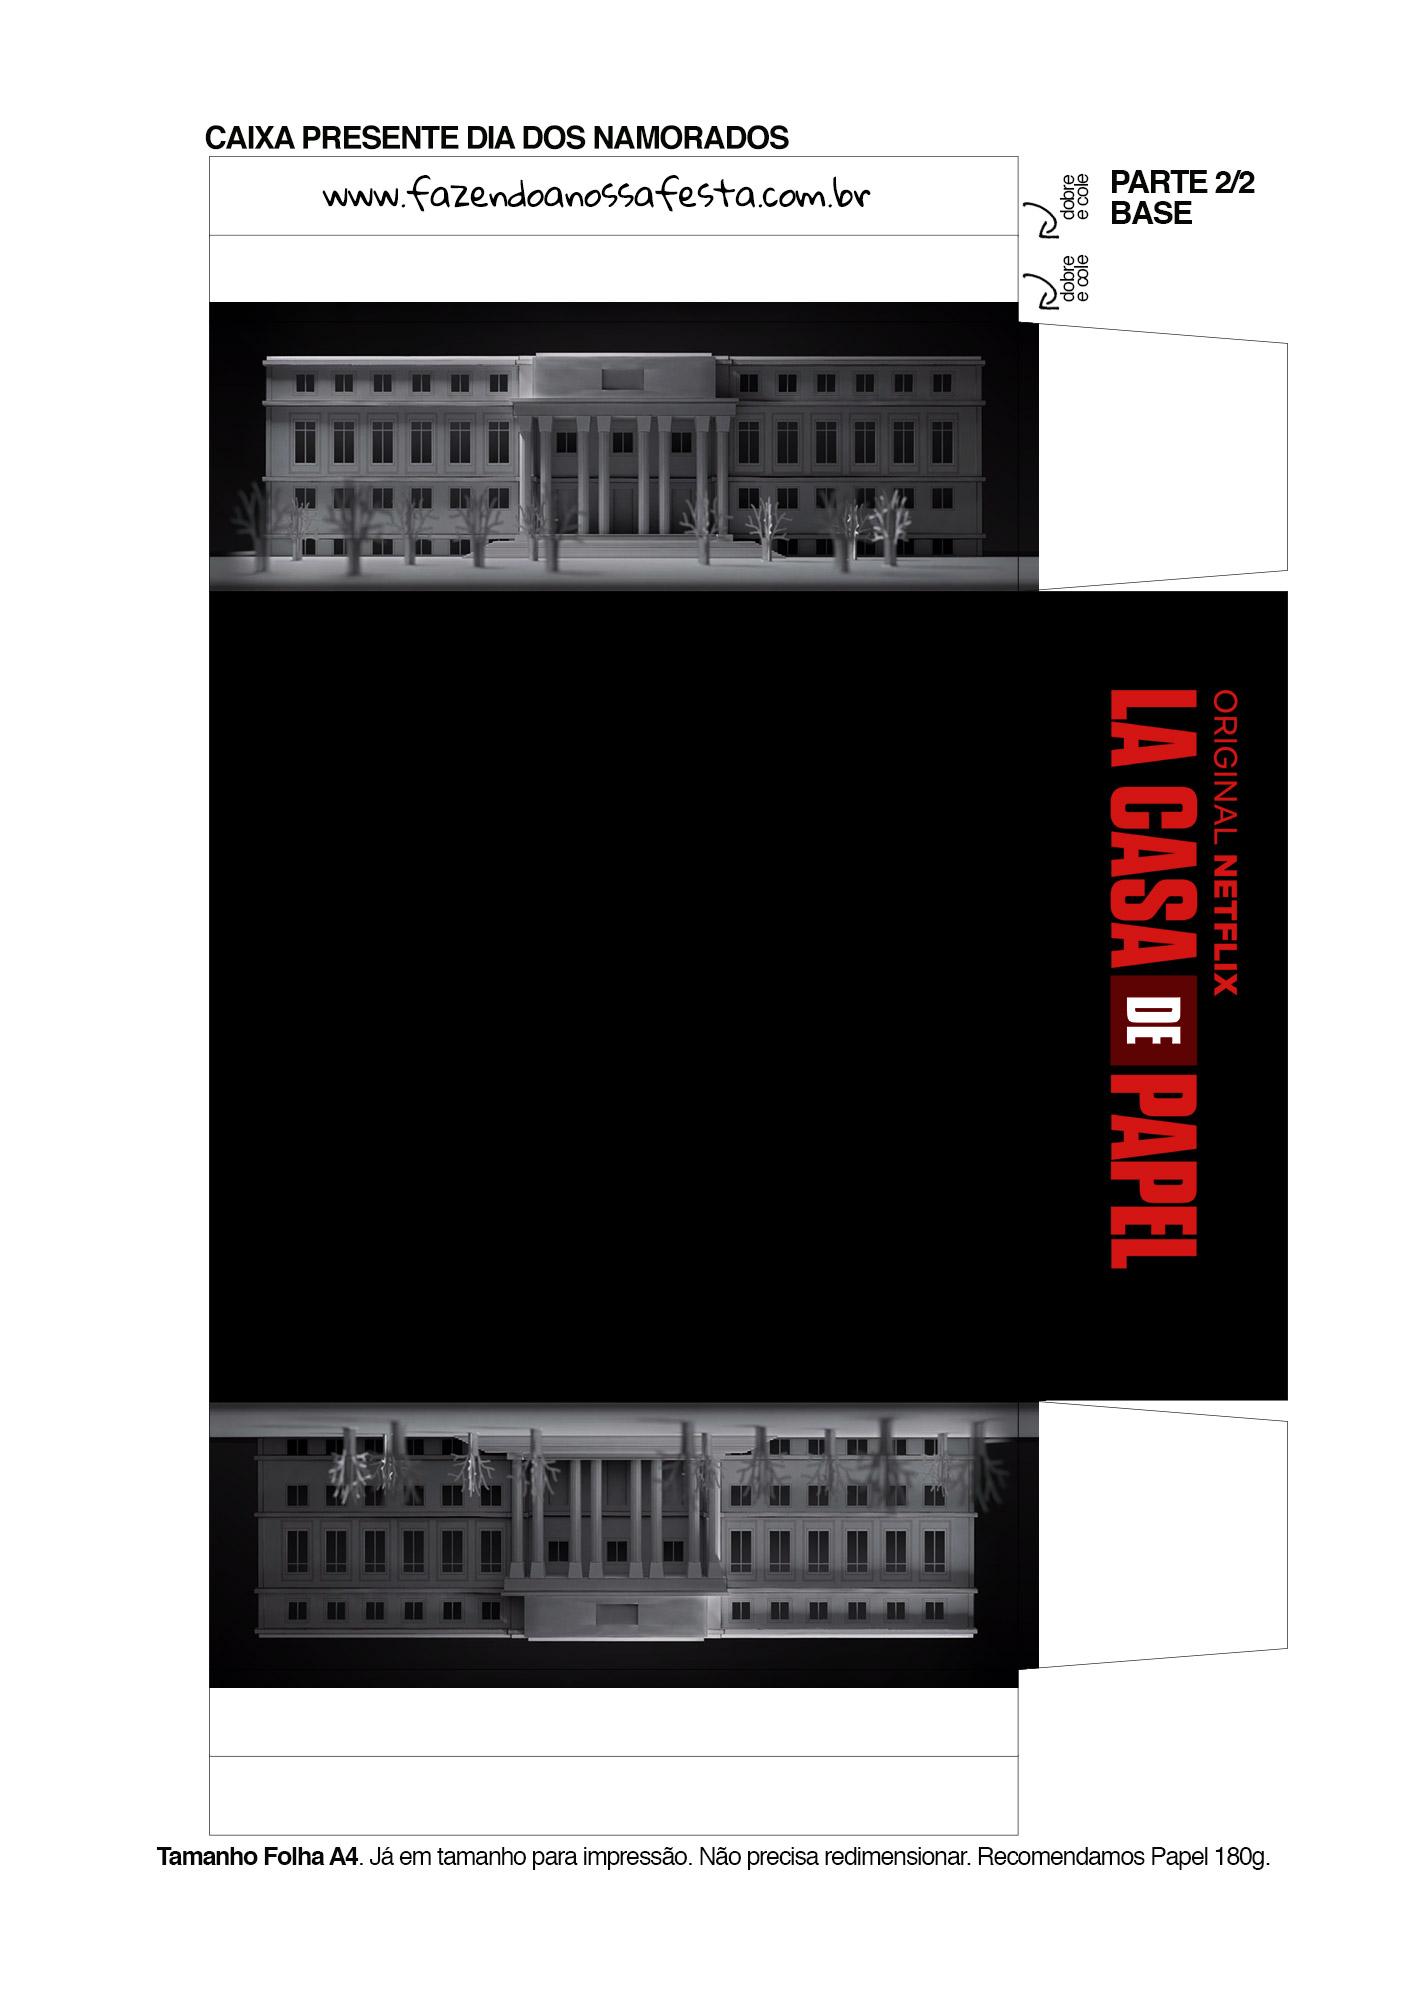 Caixa Brigadeiro La Casa de Papel la casa de papel 3